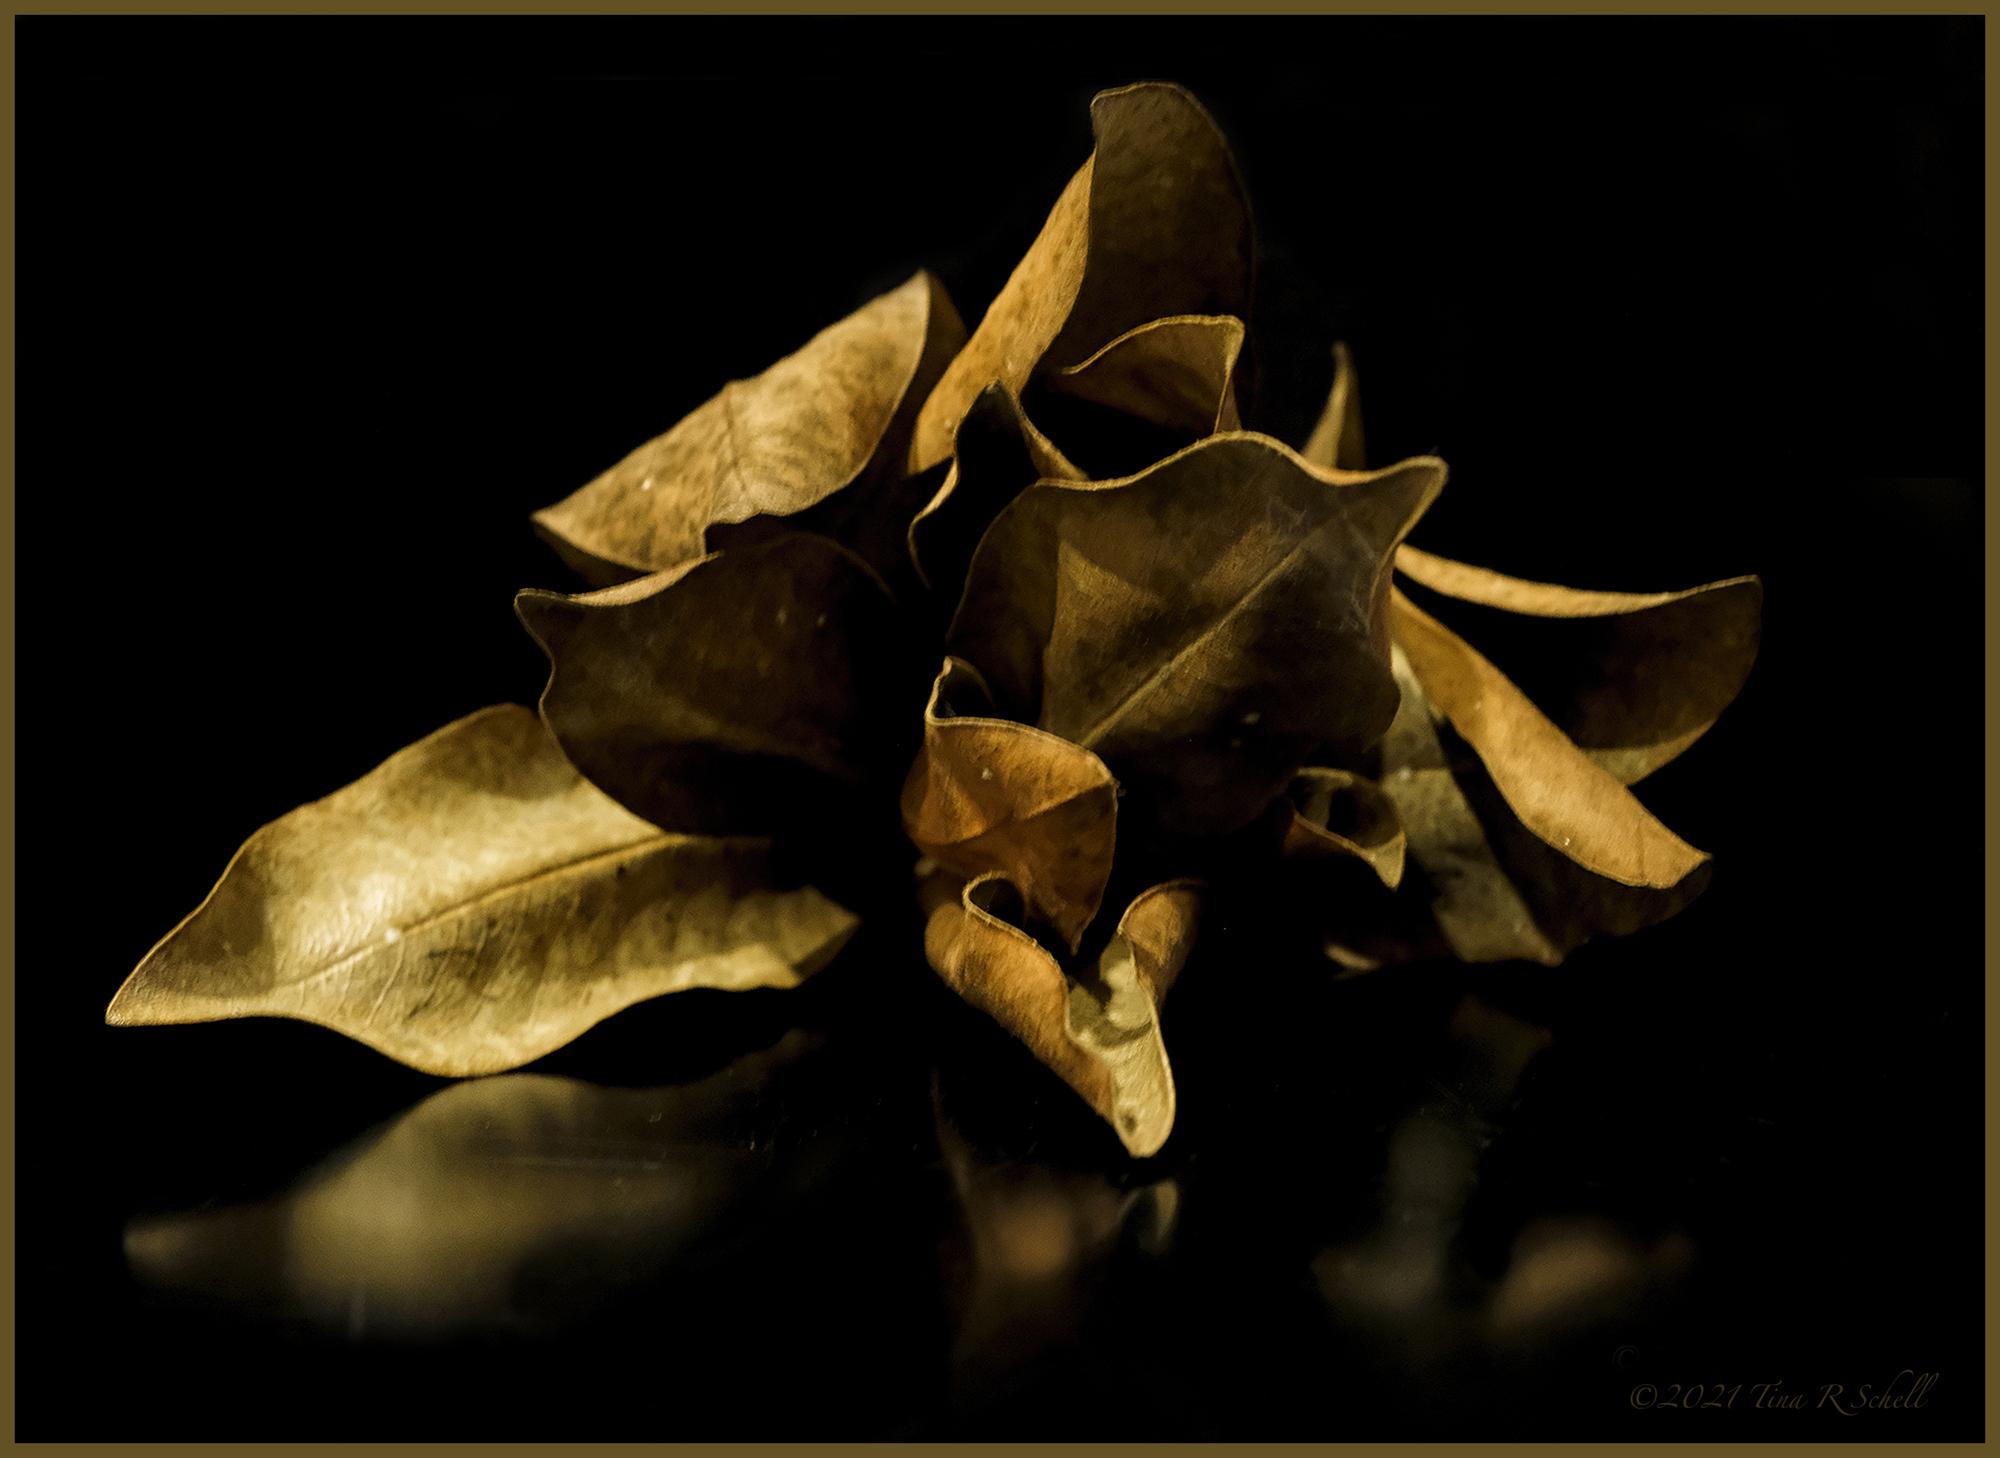 bouquet of dead leaves